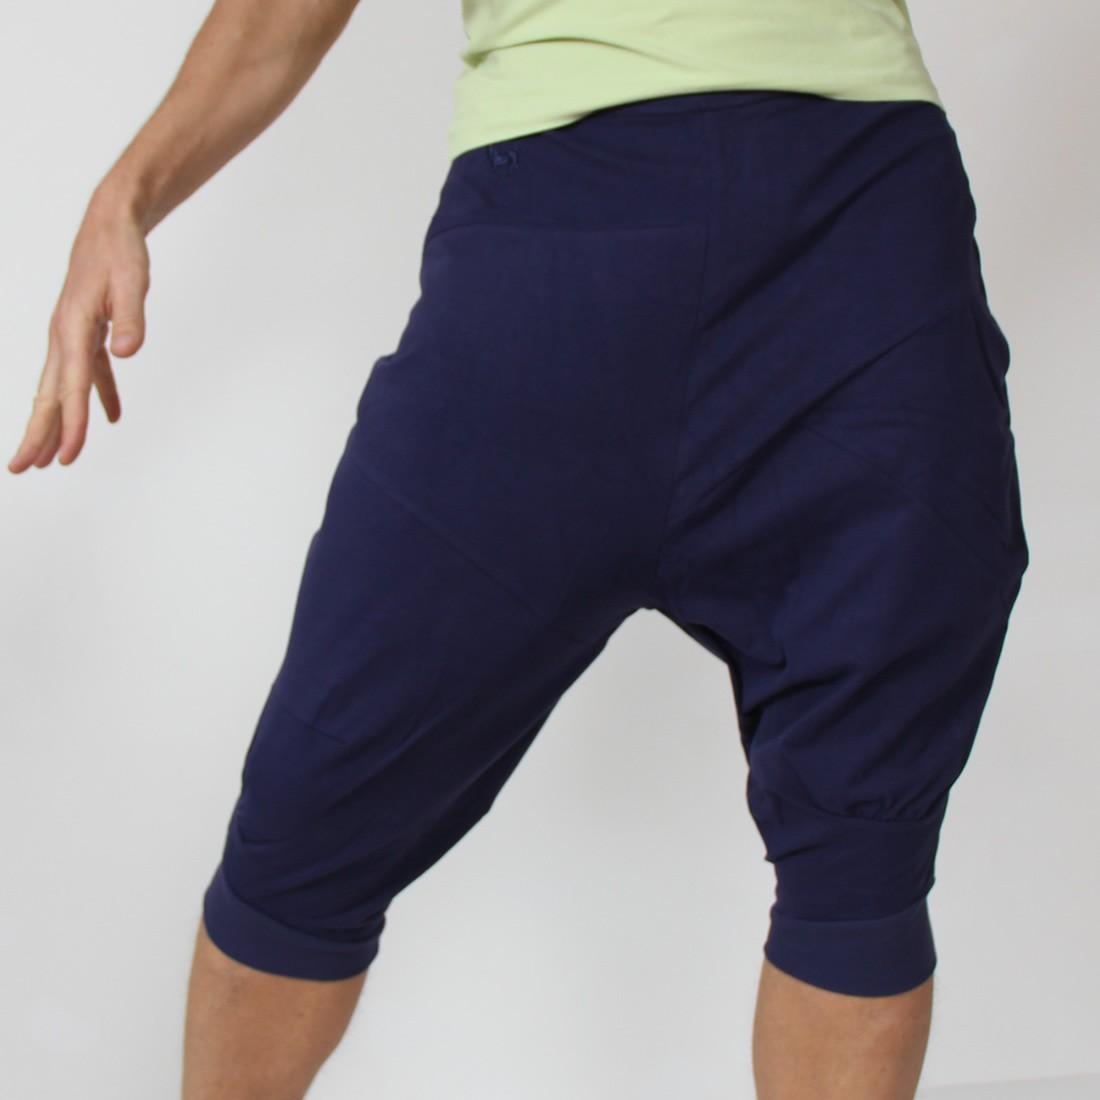 mens yoga shorts ... pasha harem yoga pants for men by prancing leopard ... ekptldp